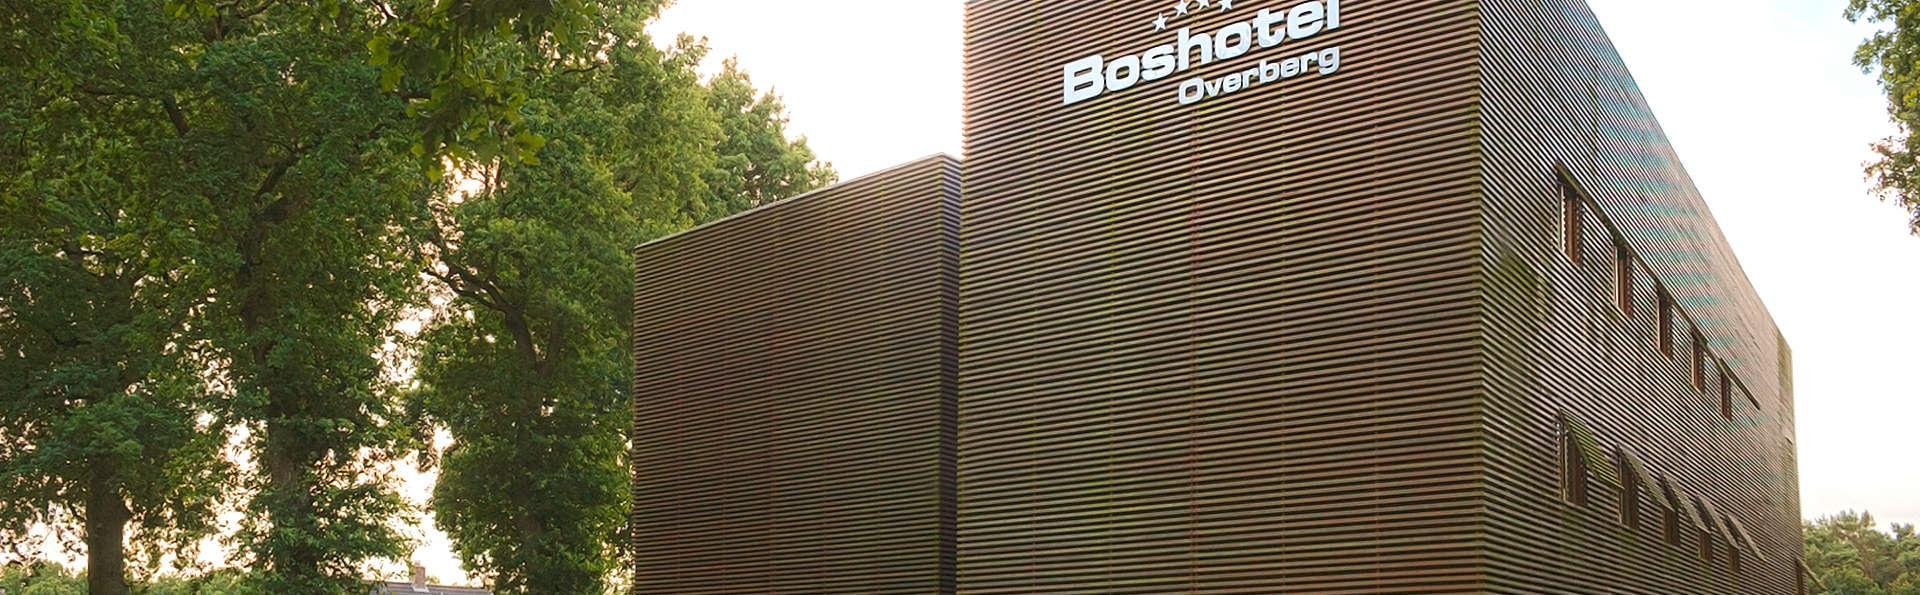 Hampshire Boshotel Overberg - EDIT_Exterior2.jpg